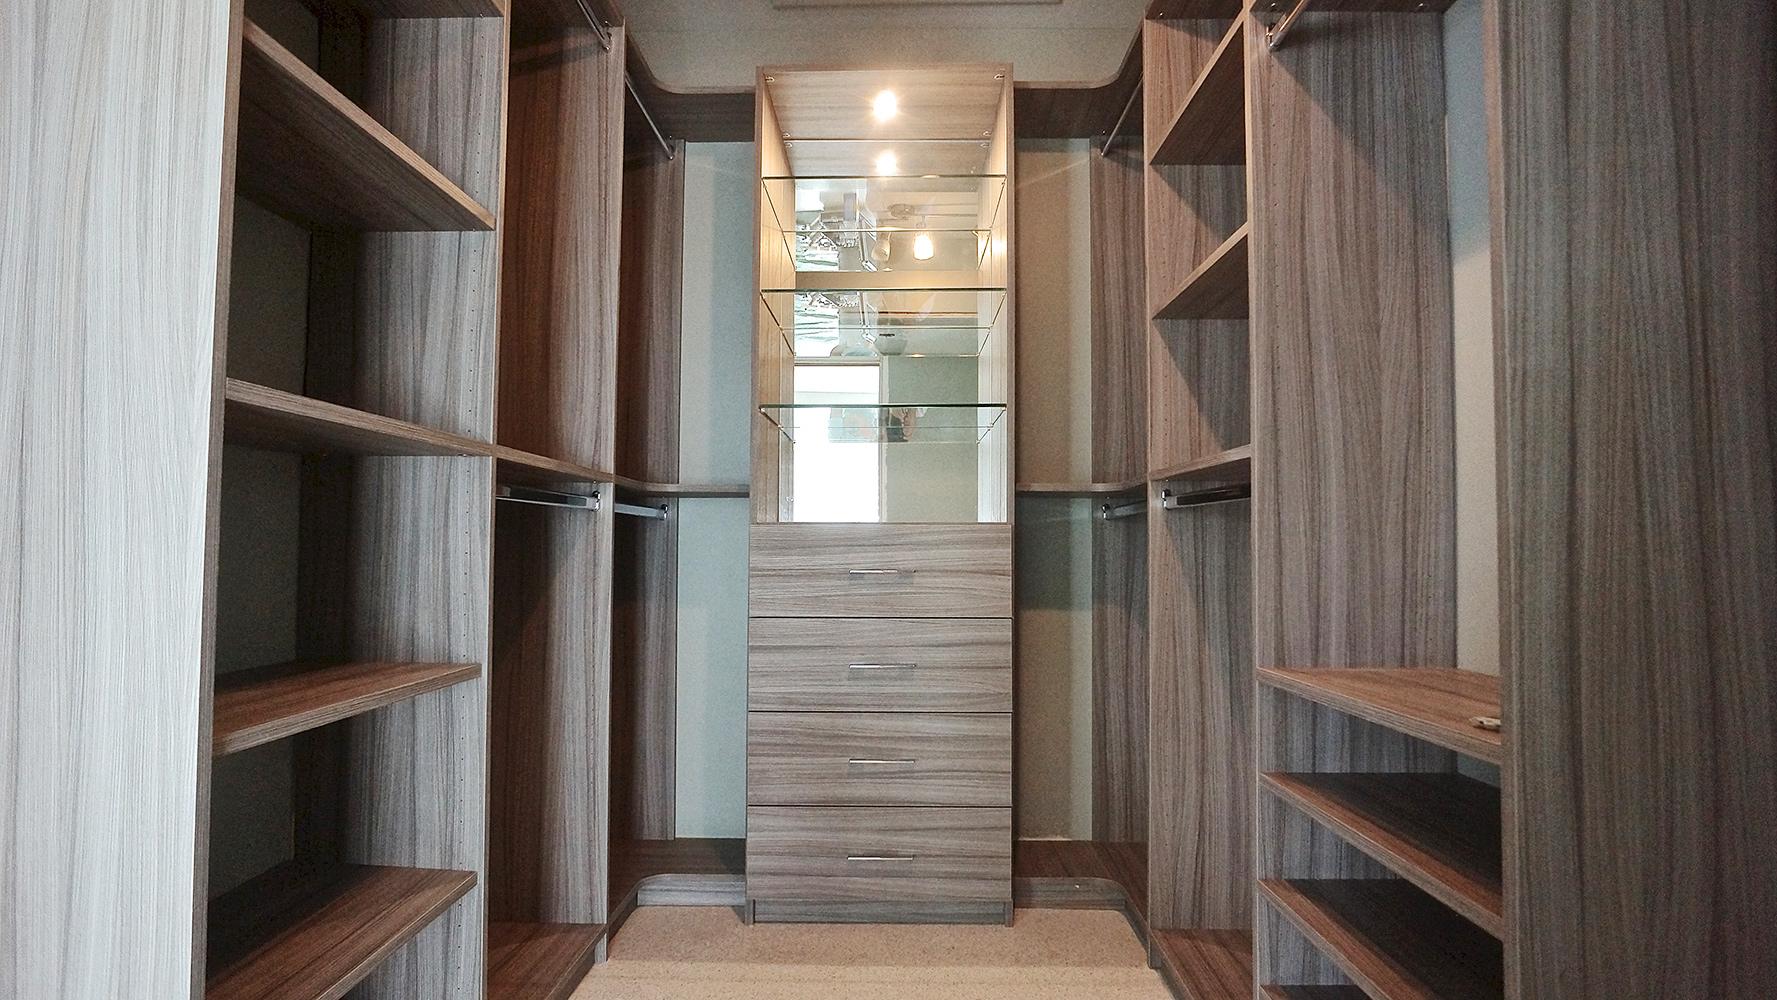 A Custom Closet Designed By Spazio Closet In Miami, Florida